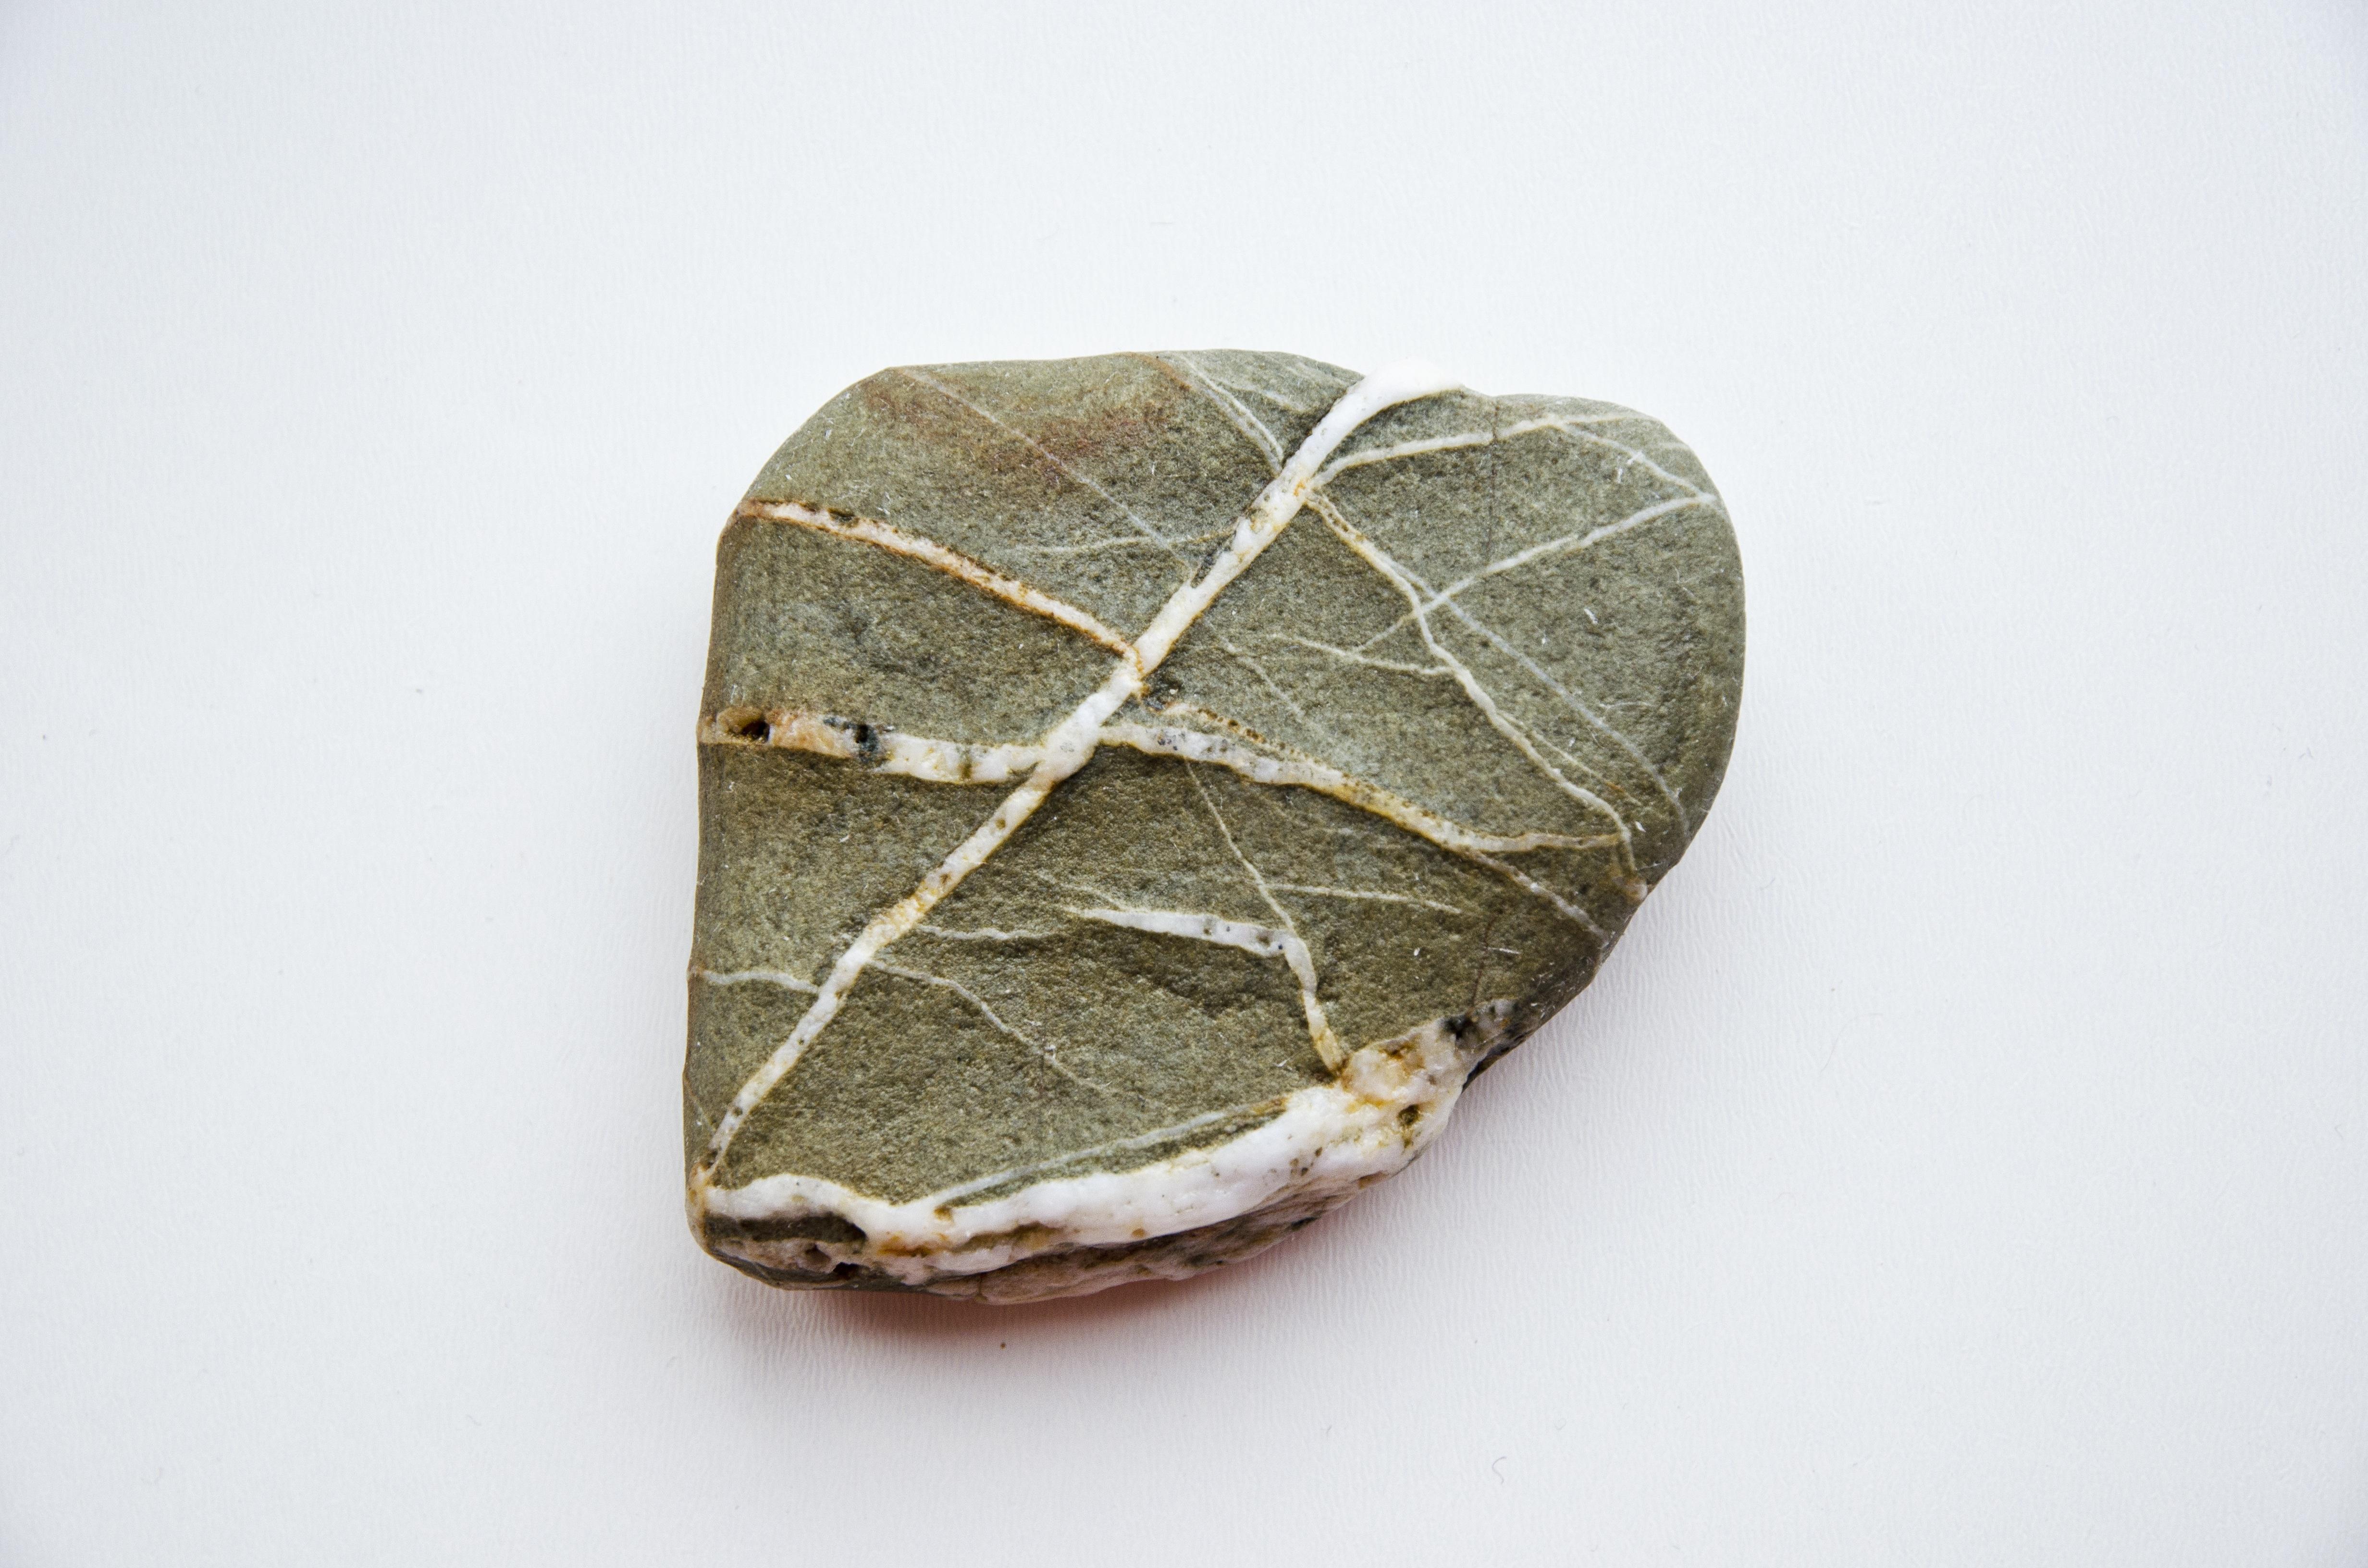 Kostenlose foto : Natur, Rock, Holz, Textur, Blatt, Blume, isoliert ...